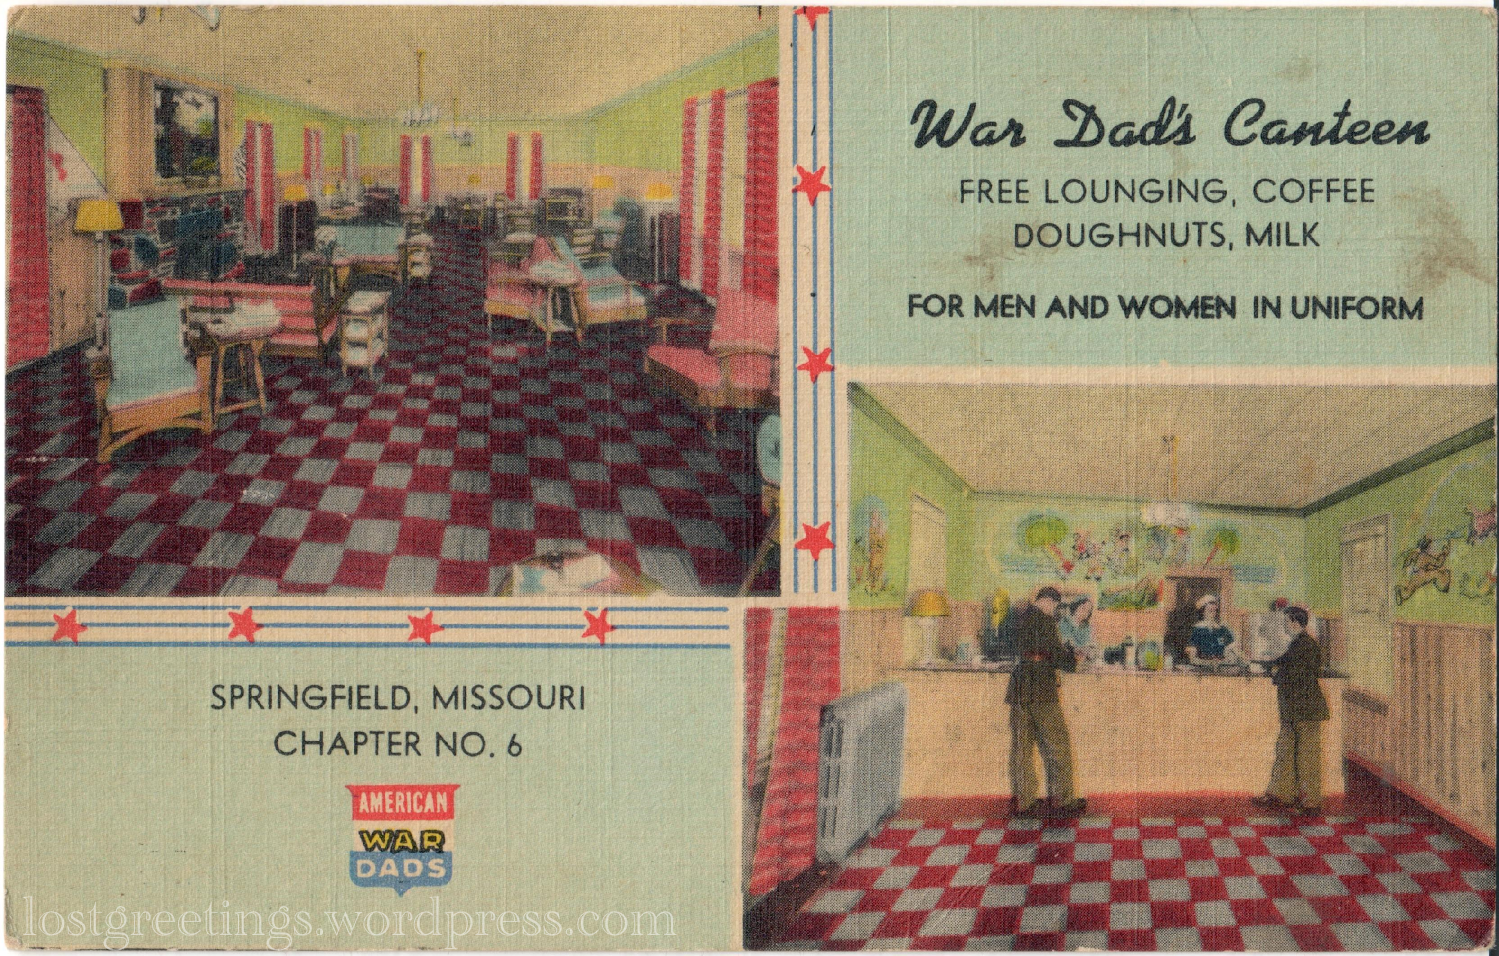 Springfield, MO War Dad_s Canteen 1944 ww2 postcard lg